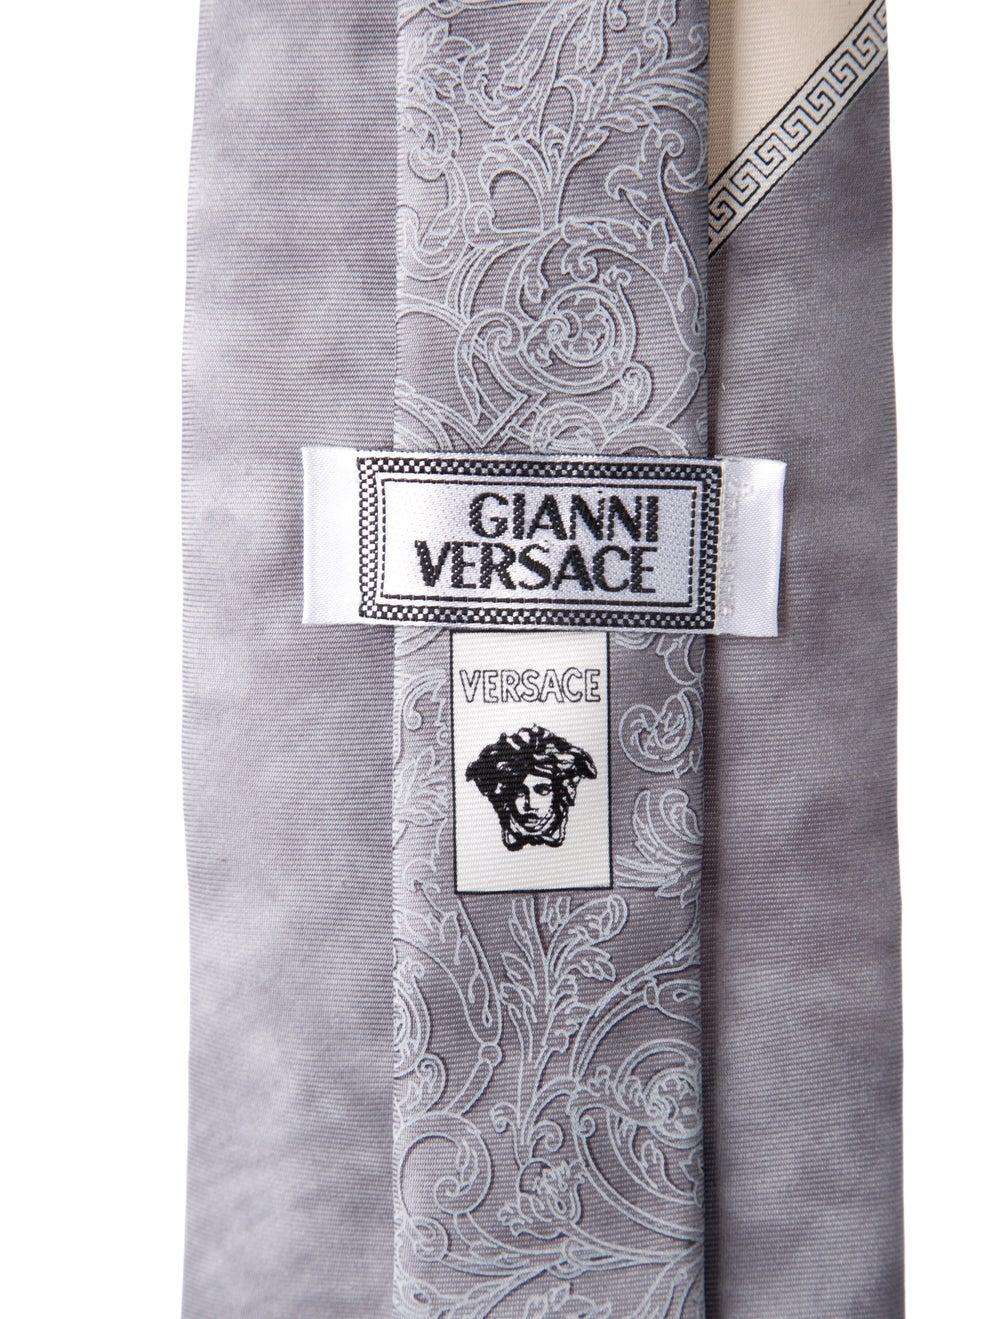 Gianni Versace Silk Printed Tie grey - image 2